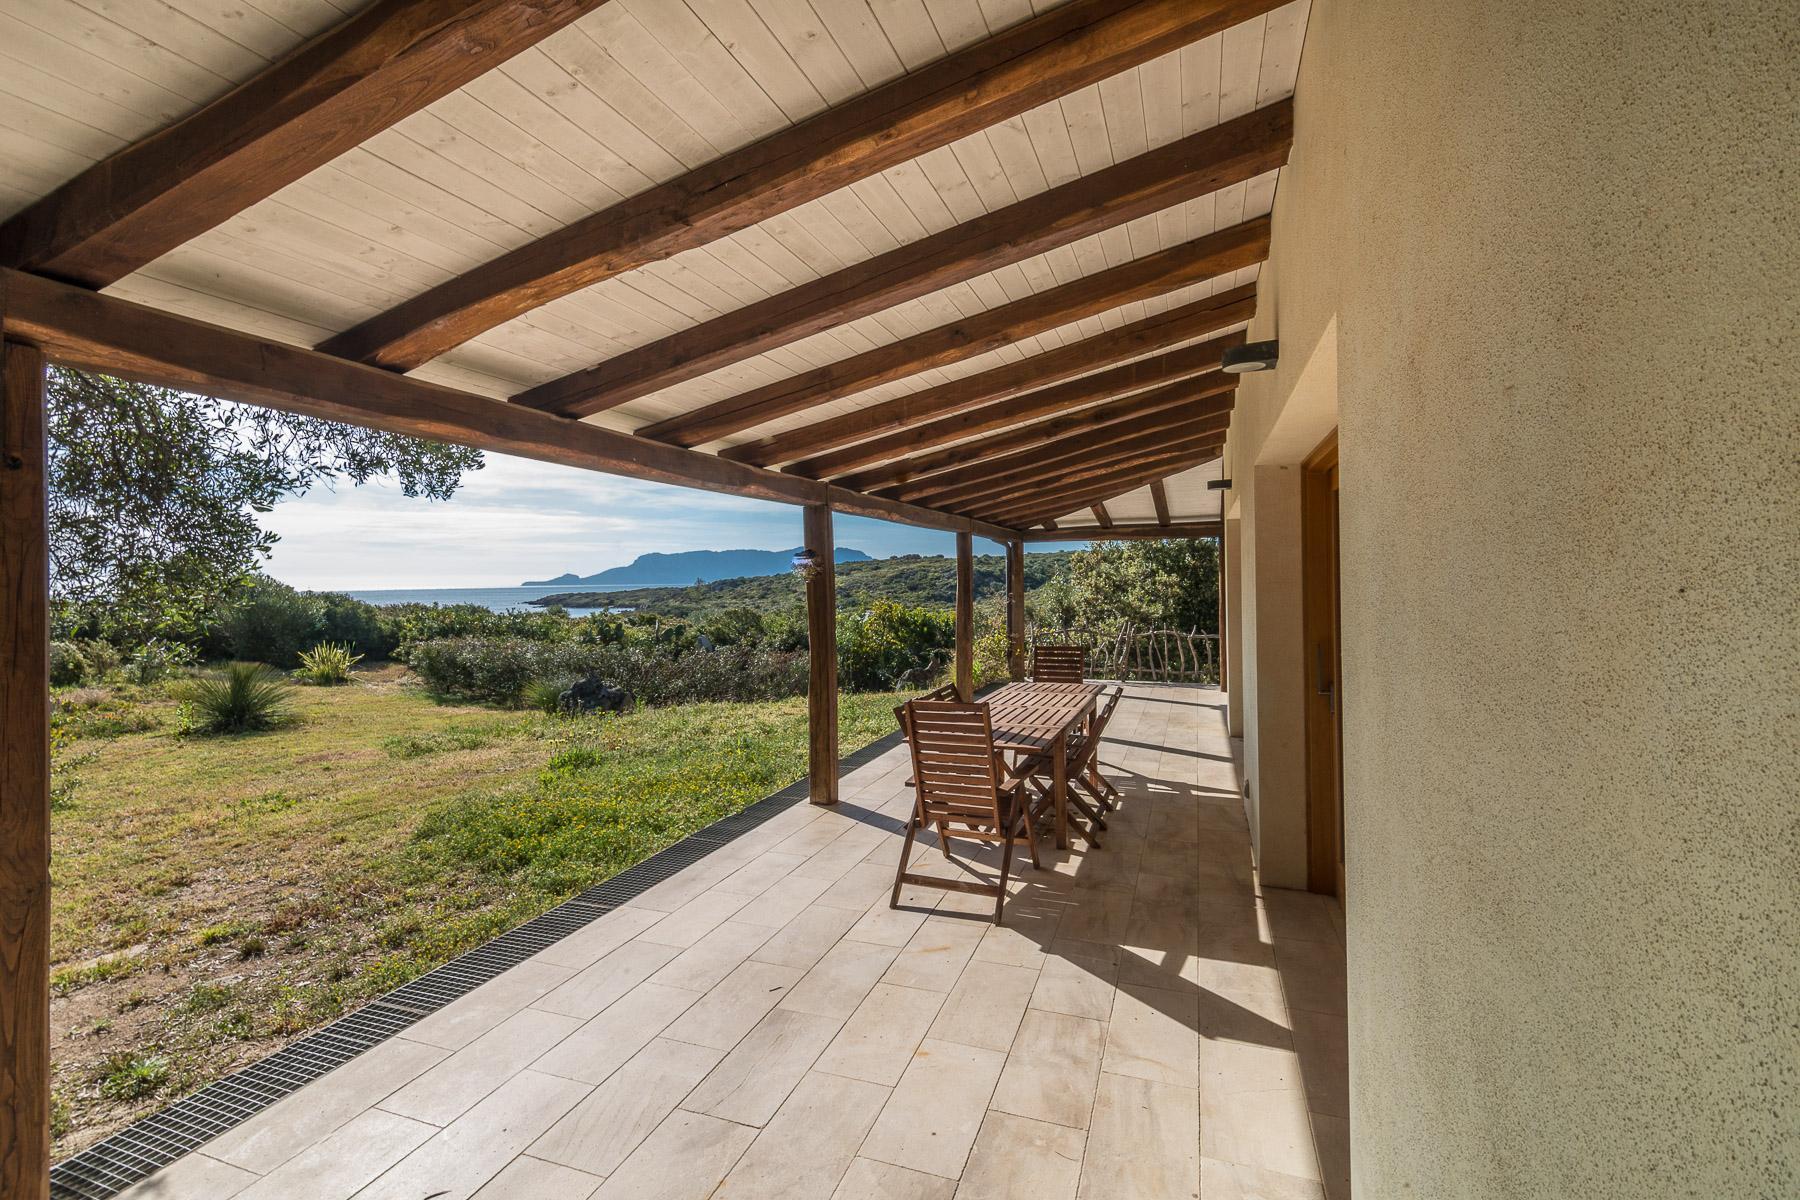 Golfo Aranci Sos Aranzos Wonderfull Villa with direct access to the beach - 3